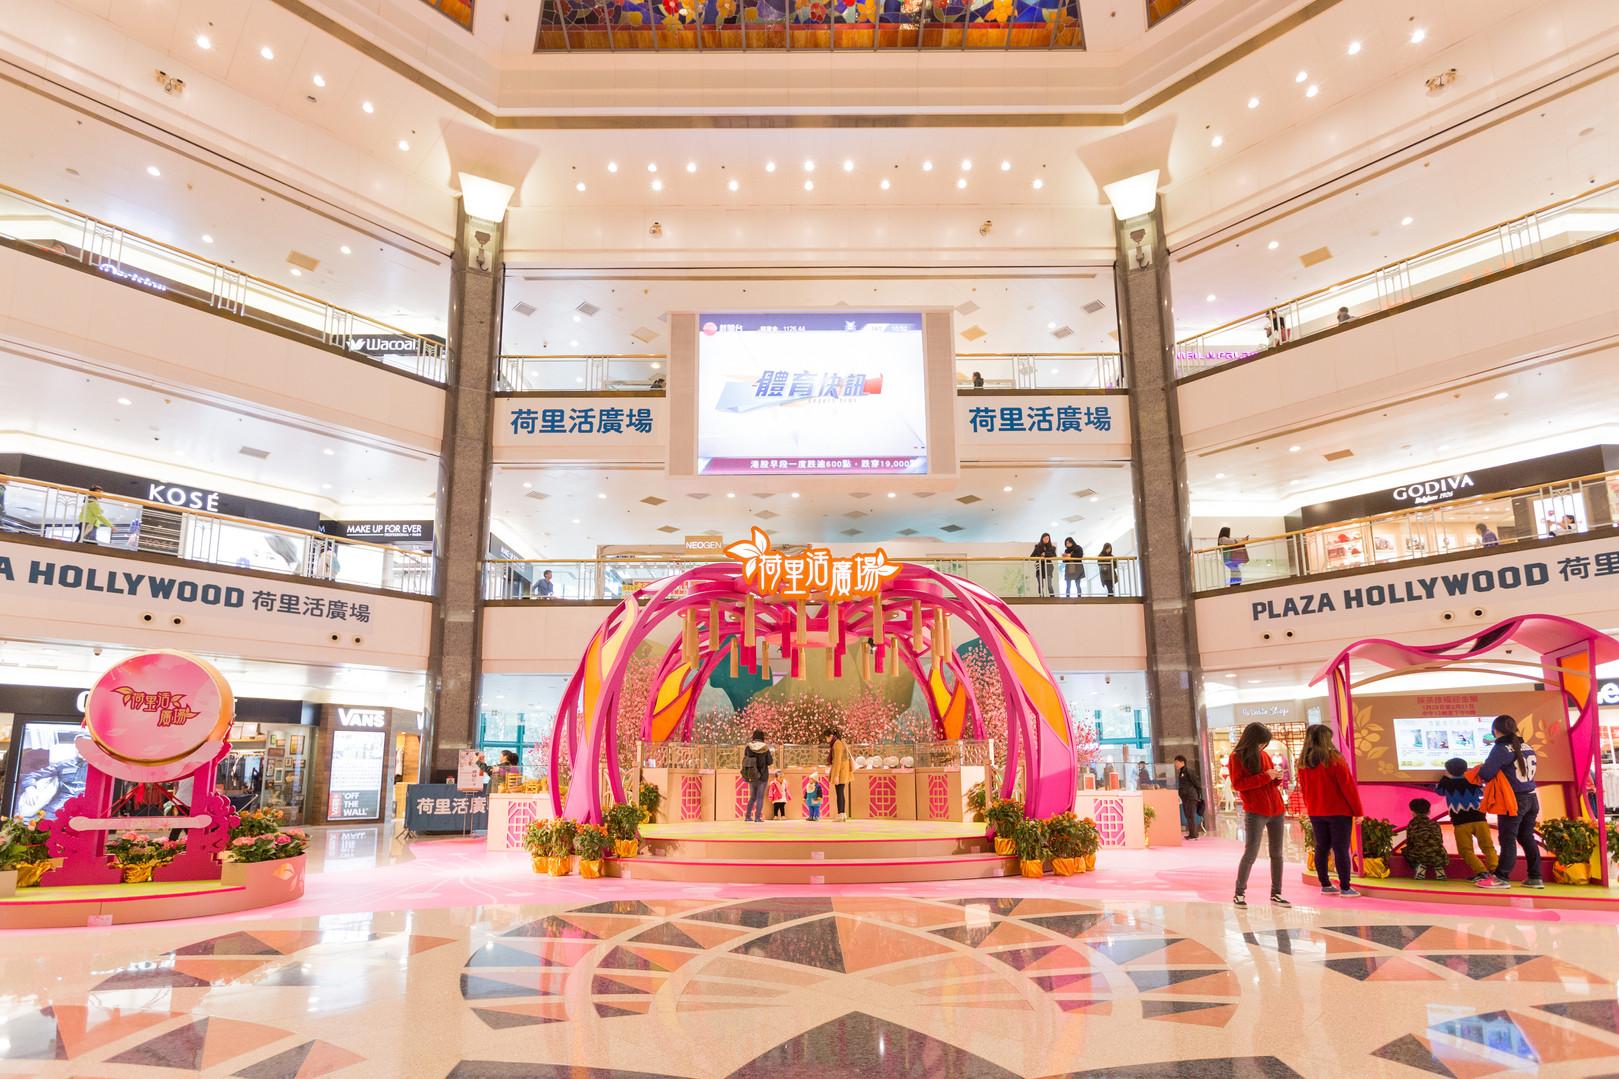 Plaza Hollwood CNY Project 荷里活广场春节项目 2017